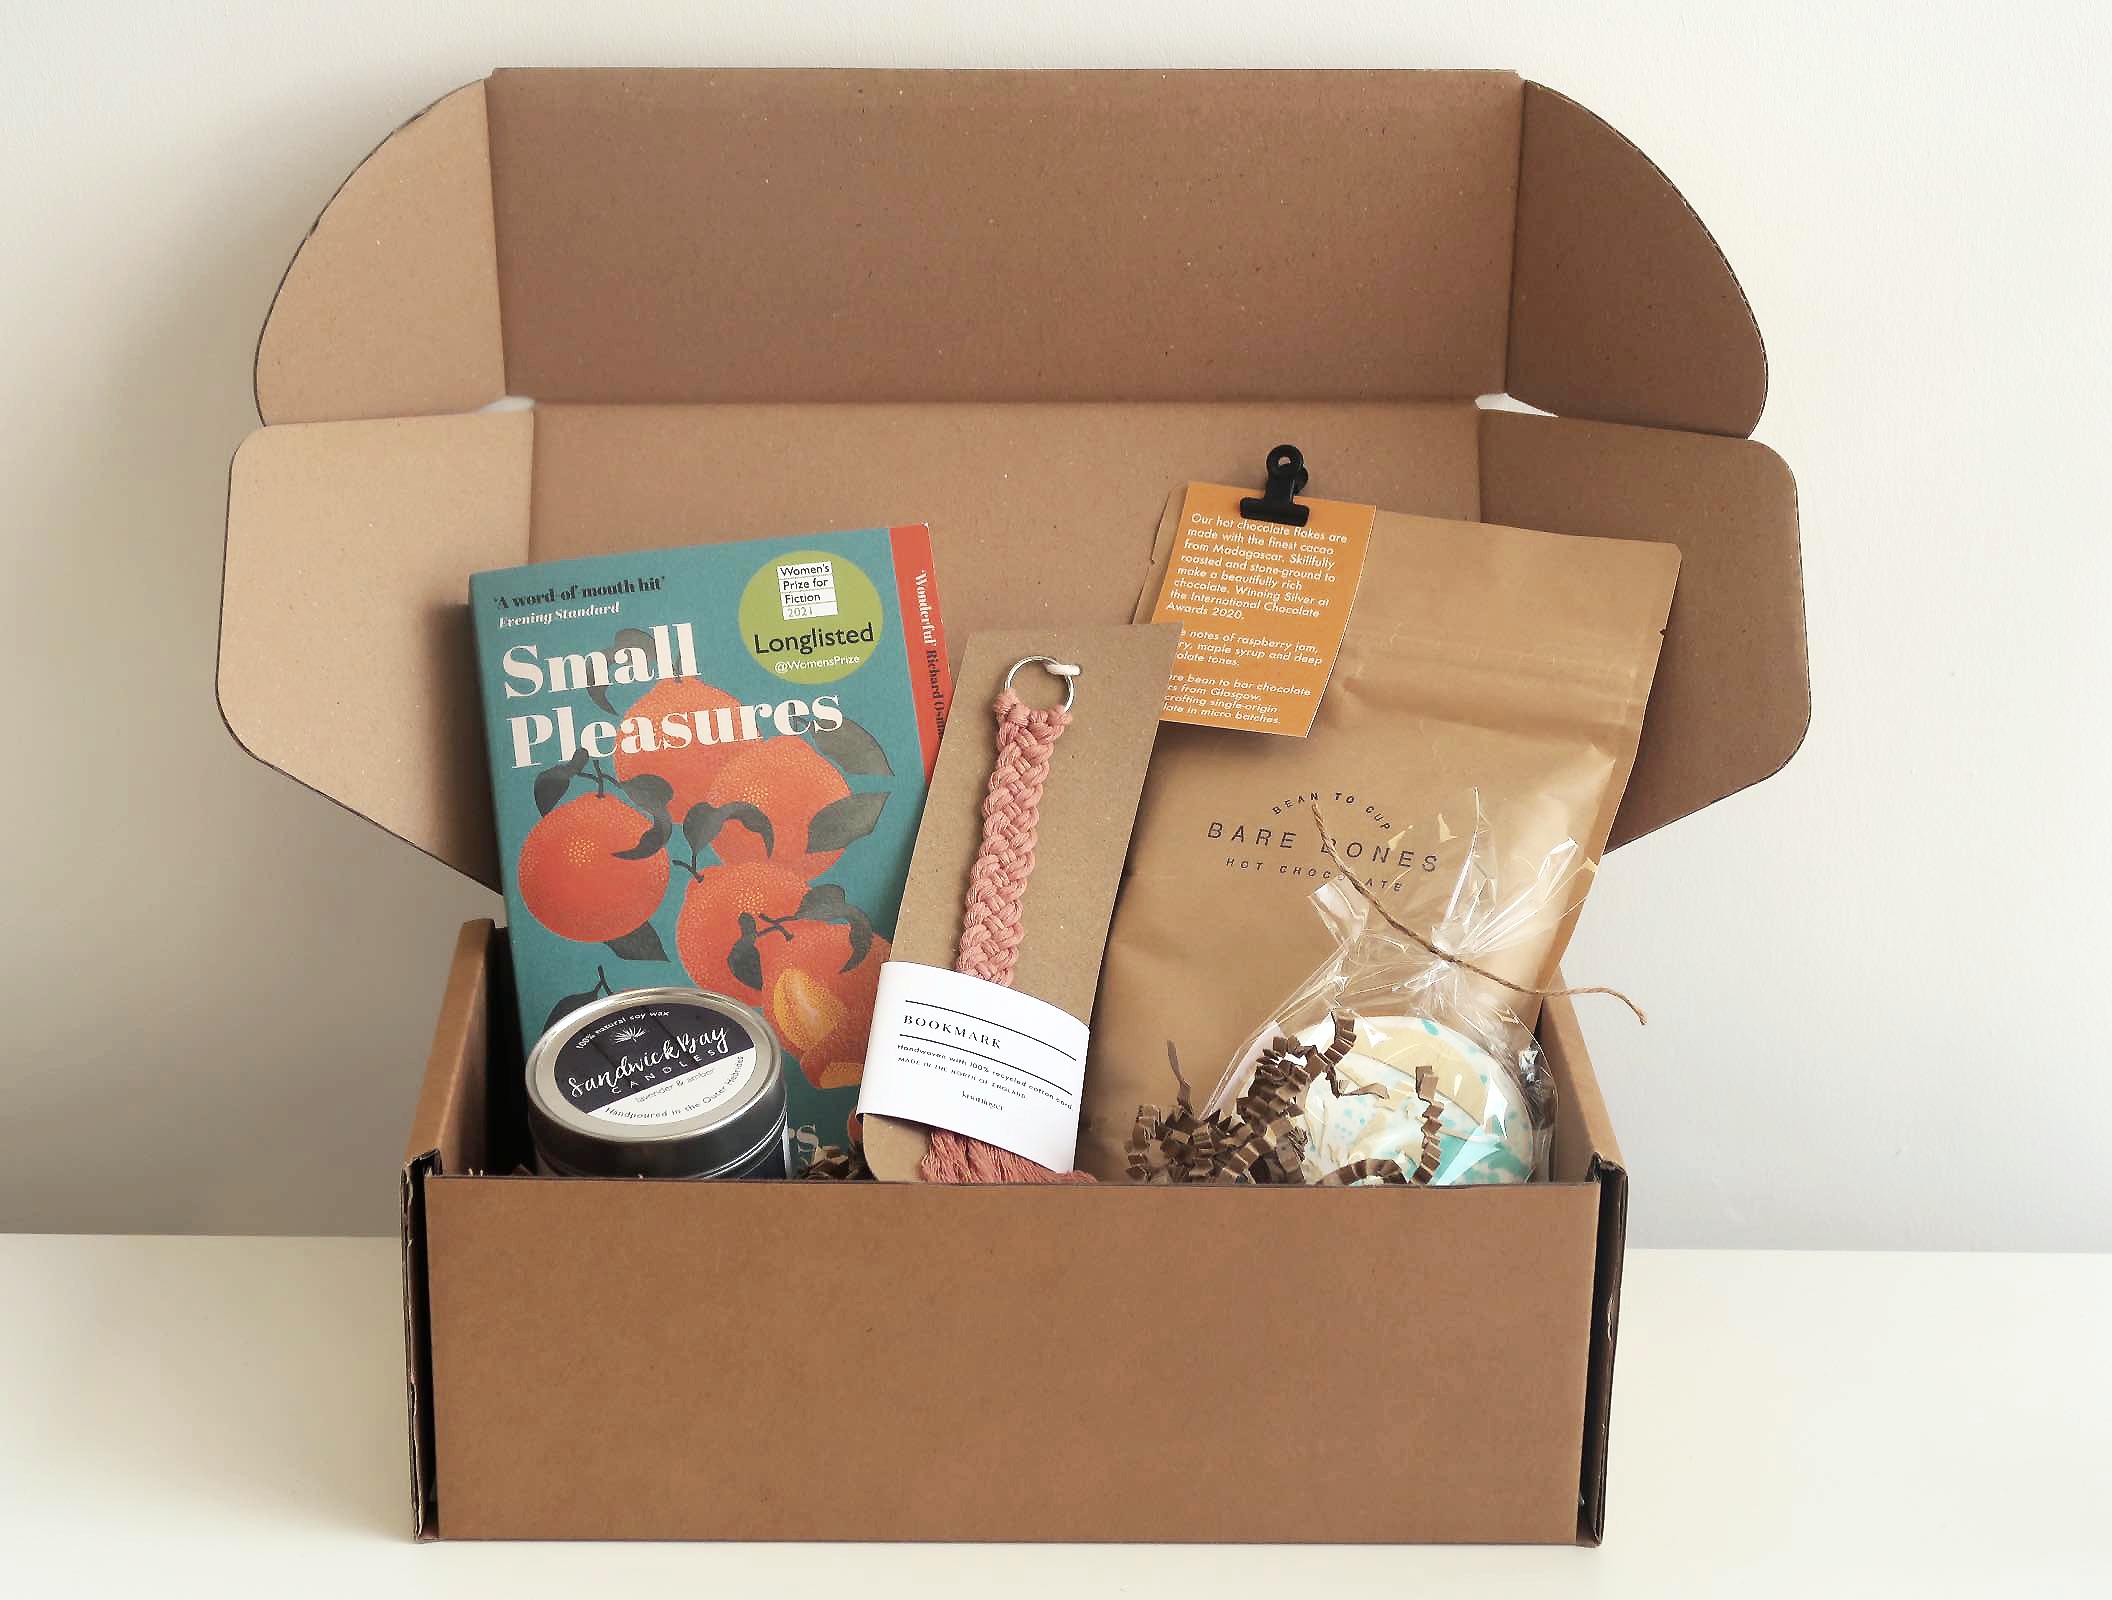 Night In Gift Box - Small Pleasures